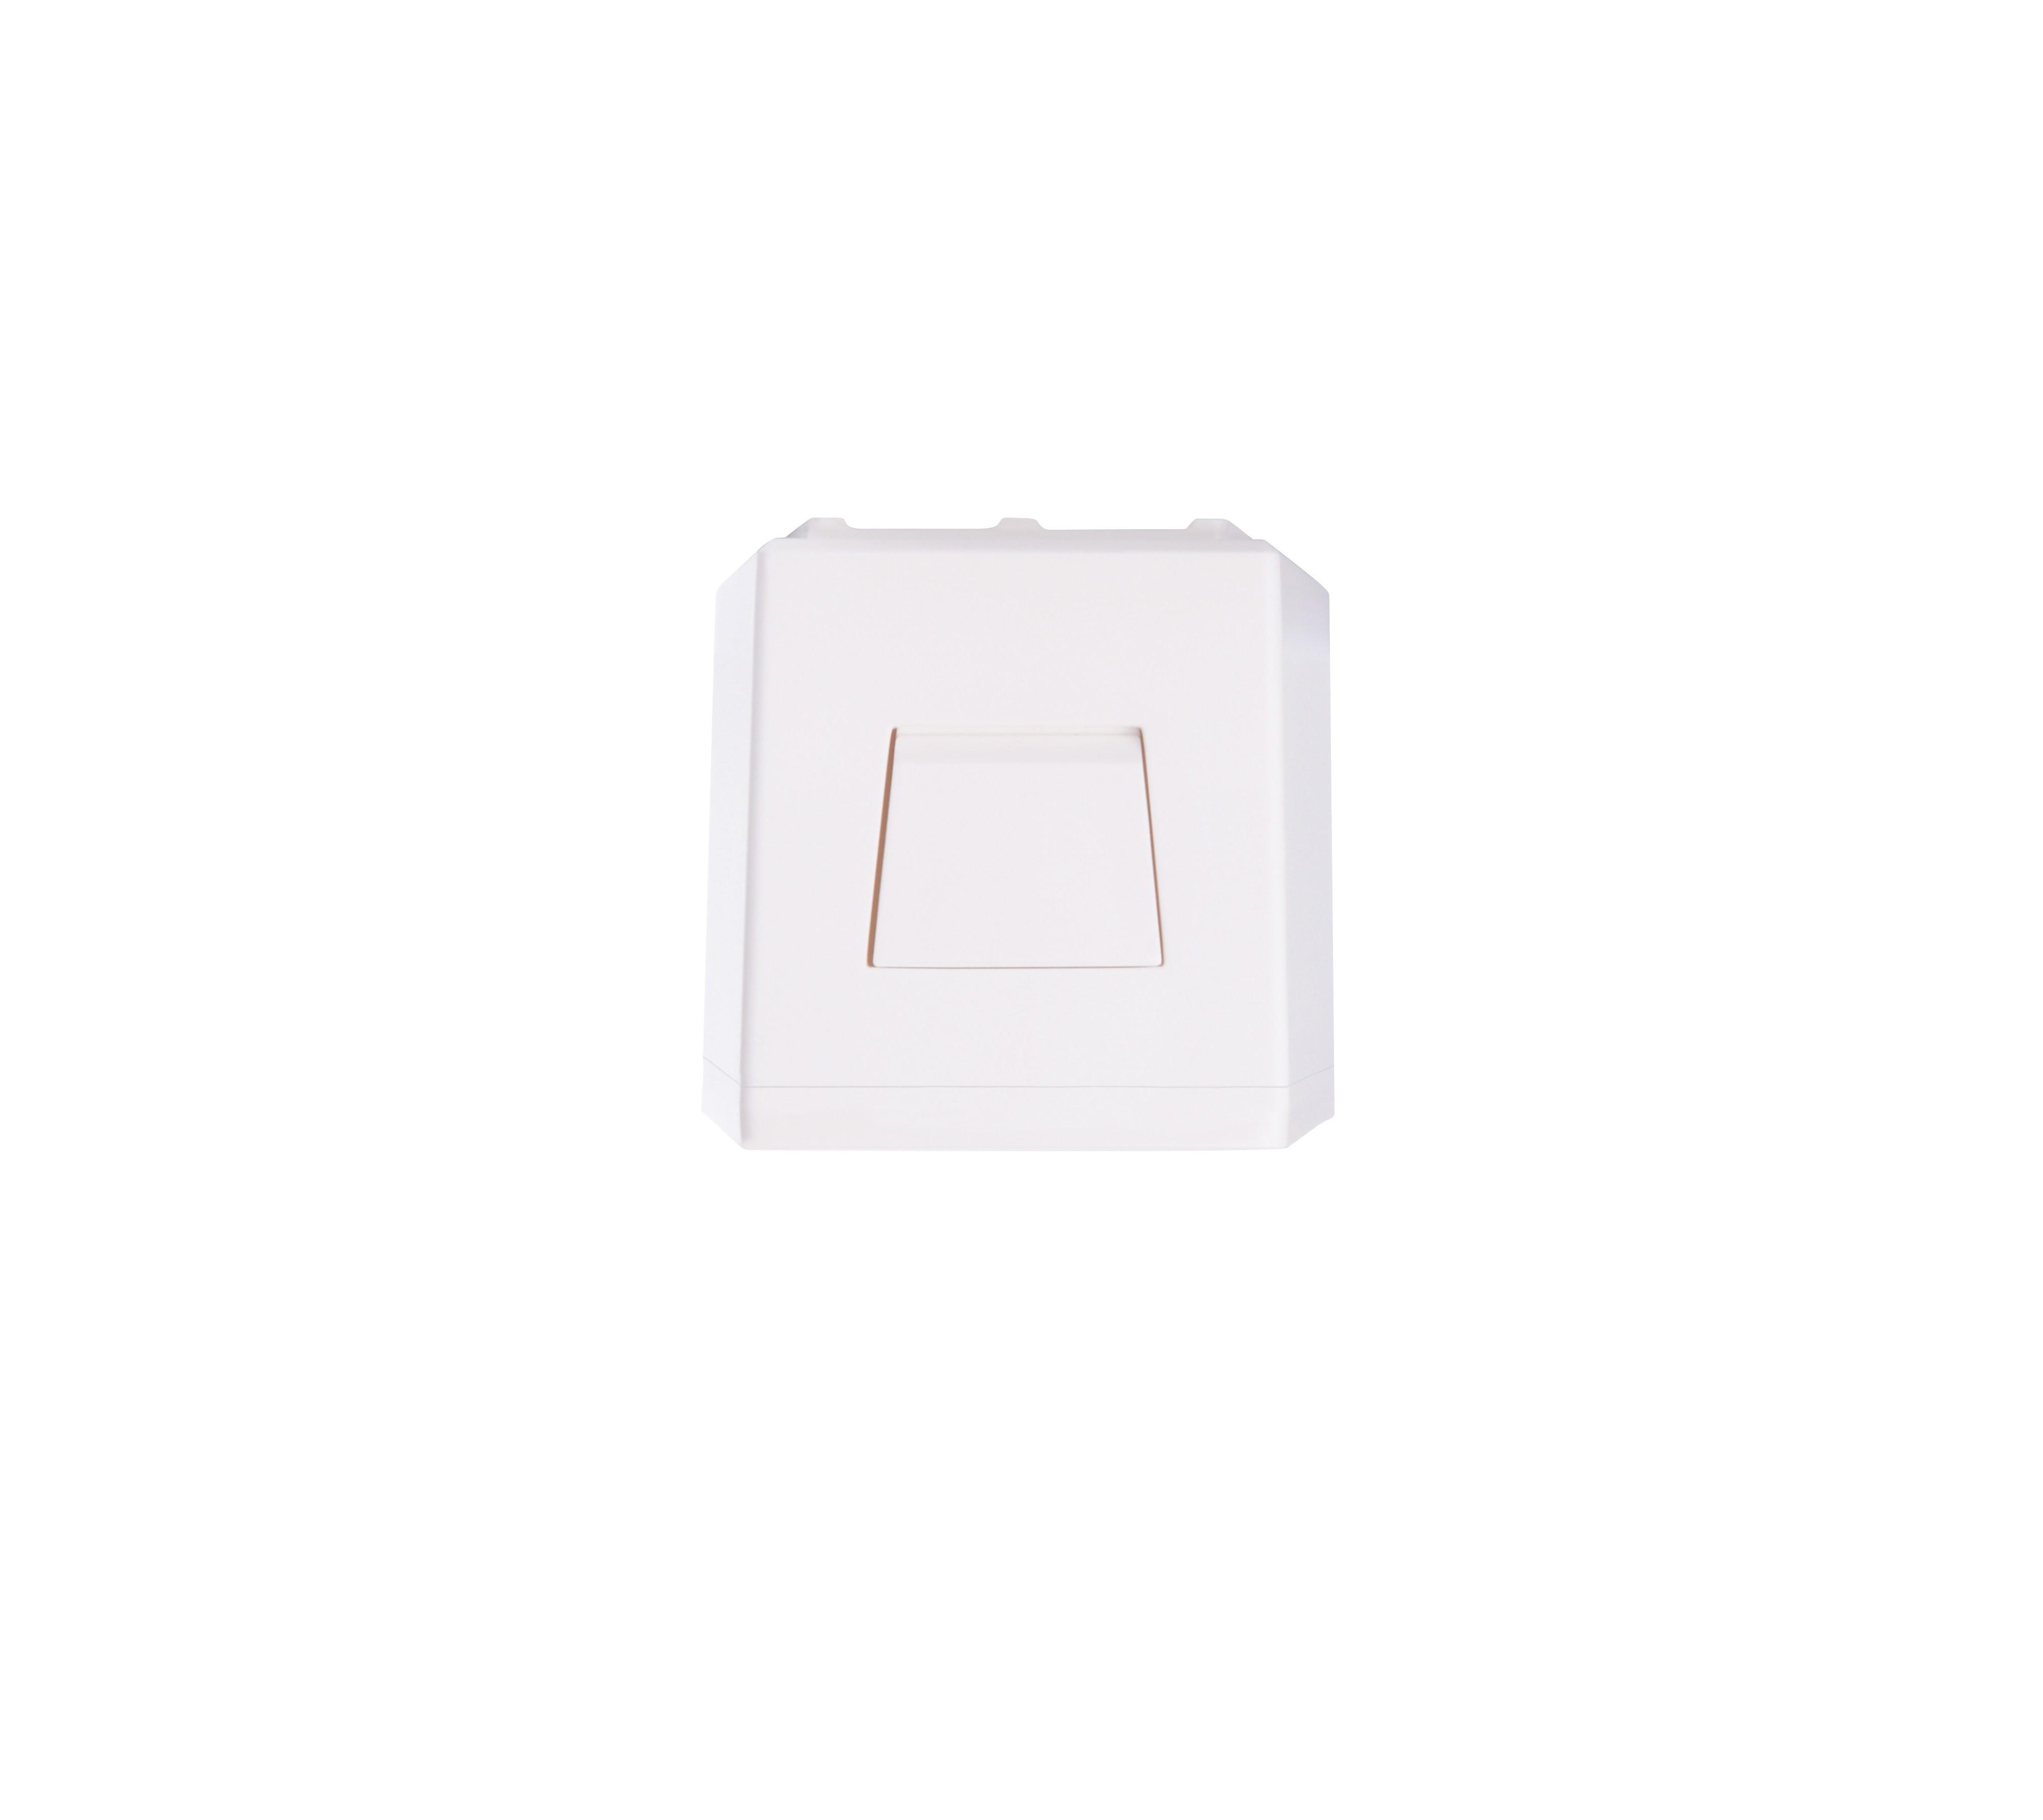 Lampa emergenta led Intelight 94517   3h mentinut test automat 1